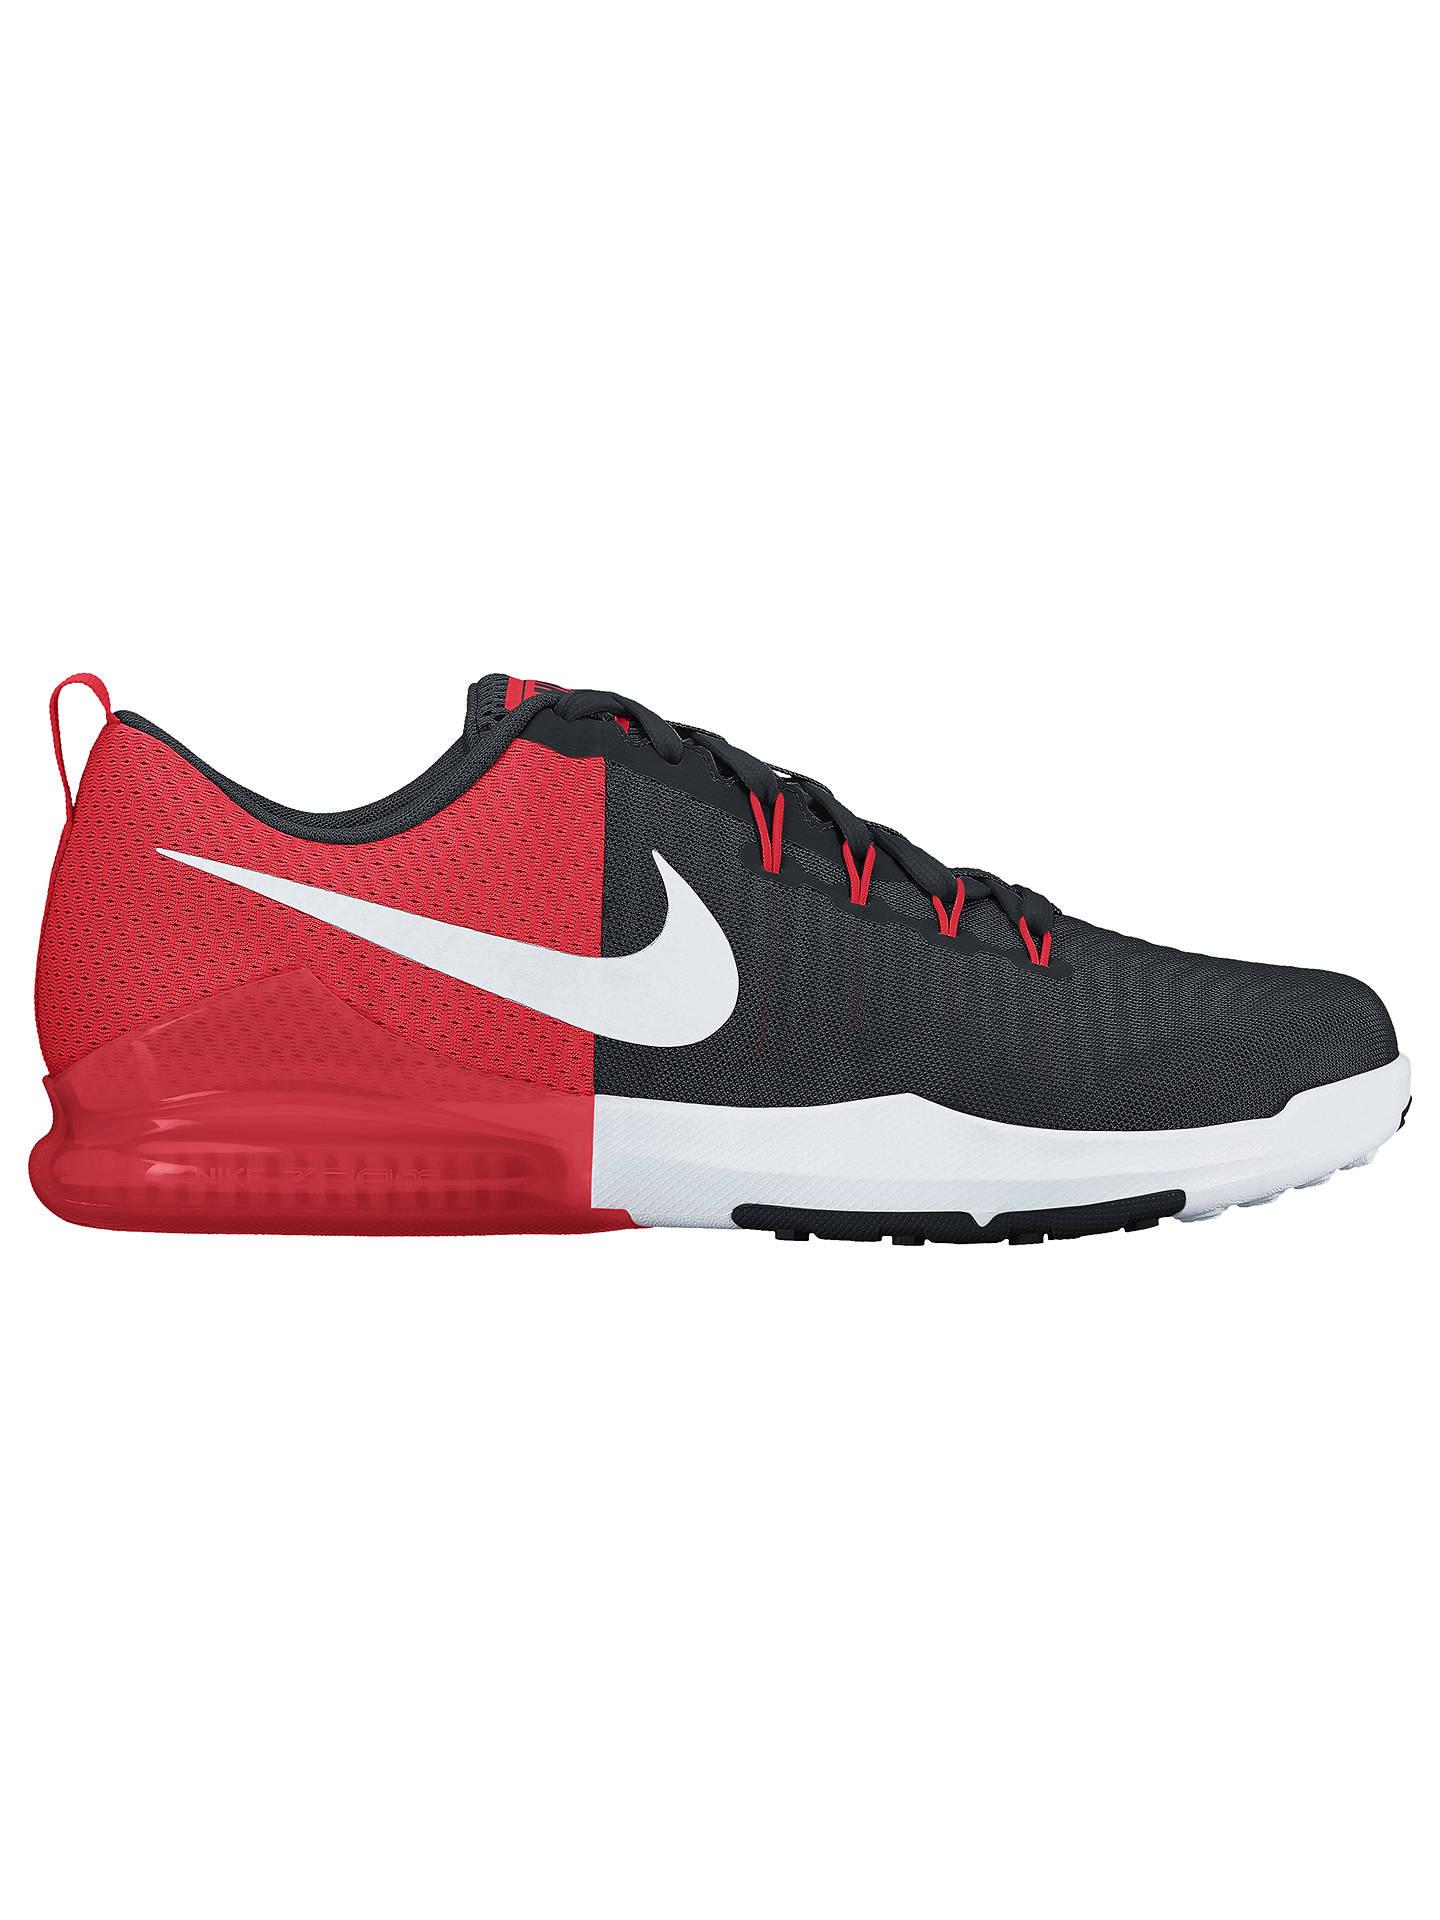 ae2bb161e74b8 Buy Nike Zoom Train Action Men s Cross Trainers